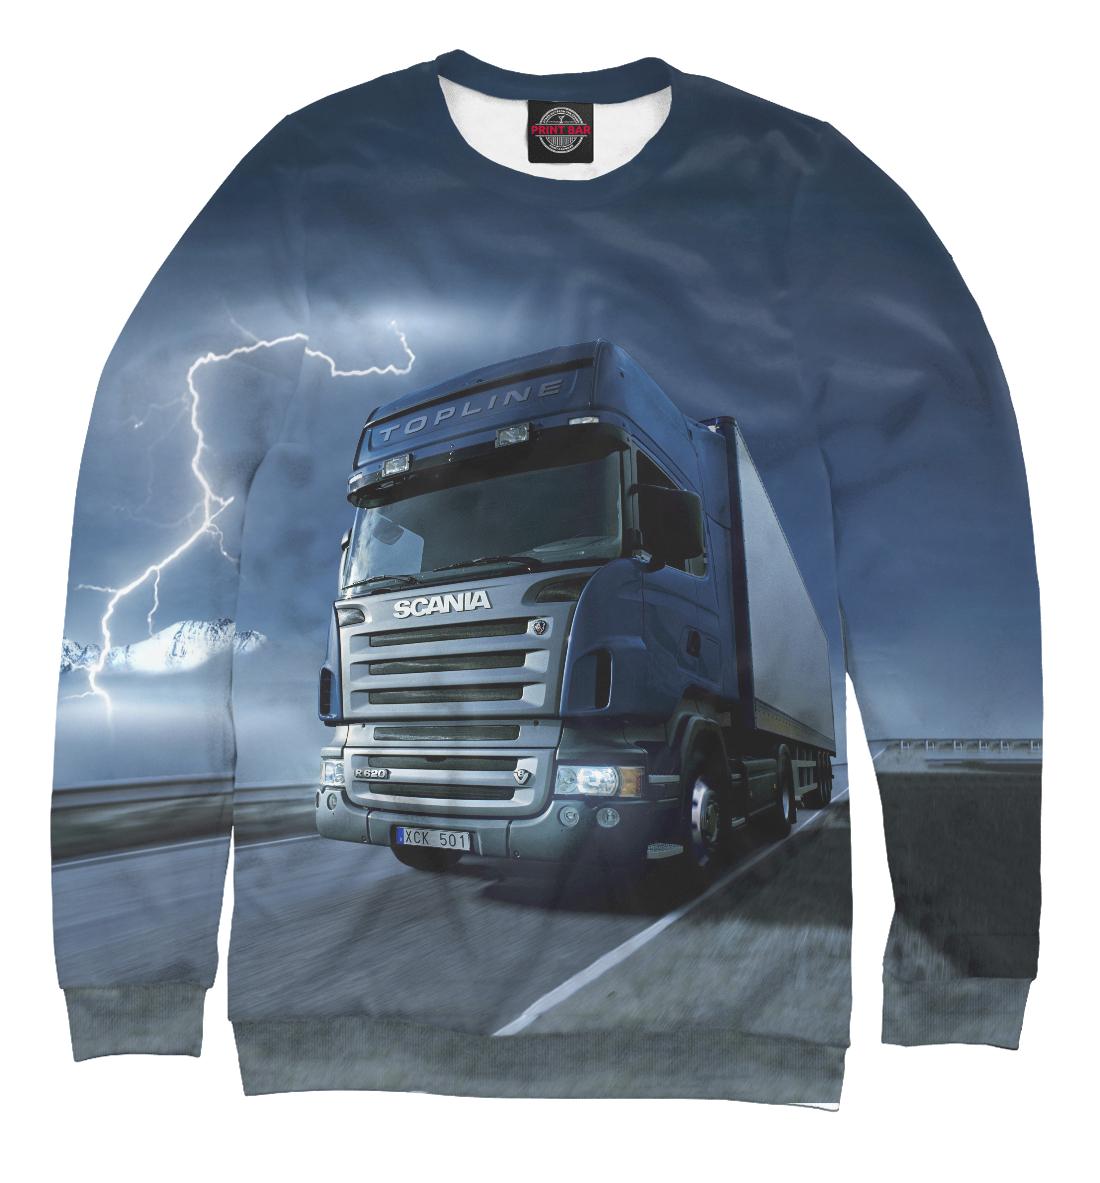 Купить Scania, Printbar, Свитшоты, GRZ-690904-swi-2